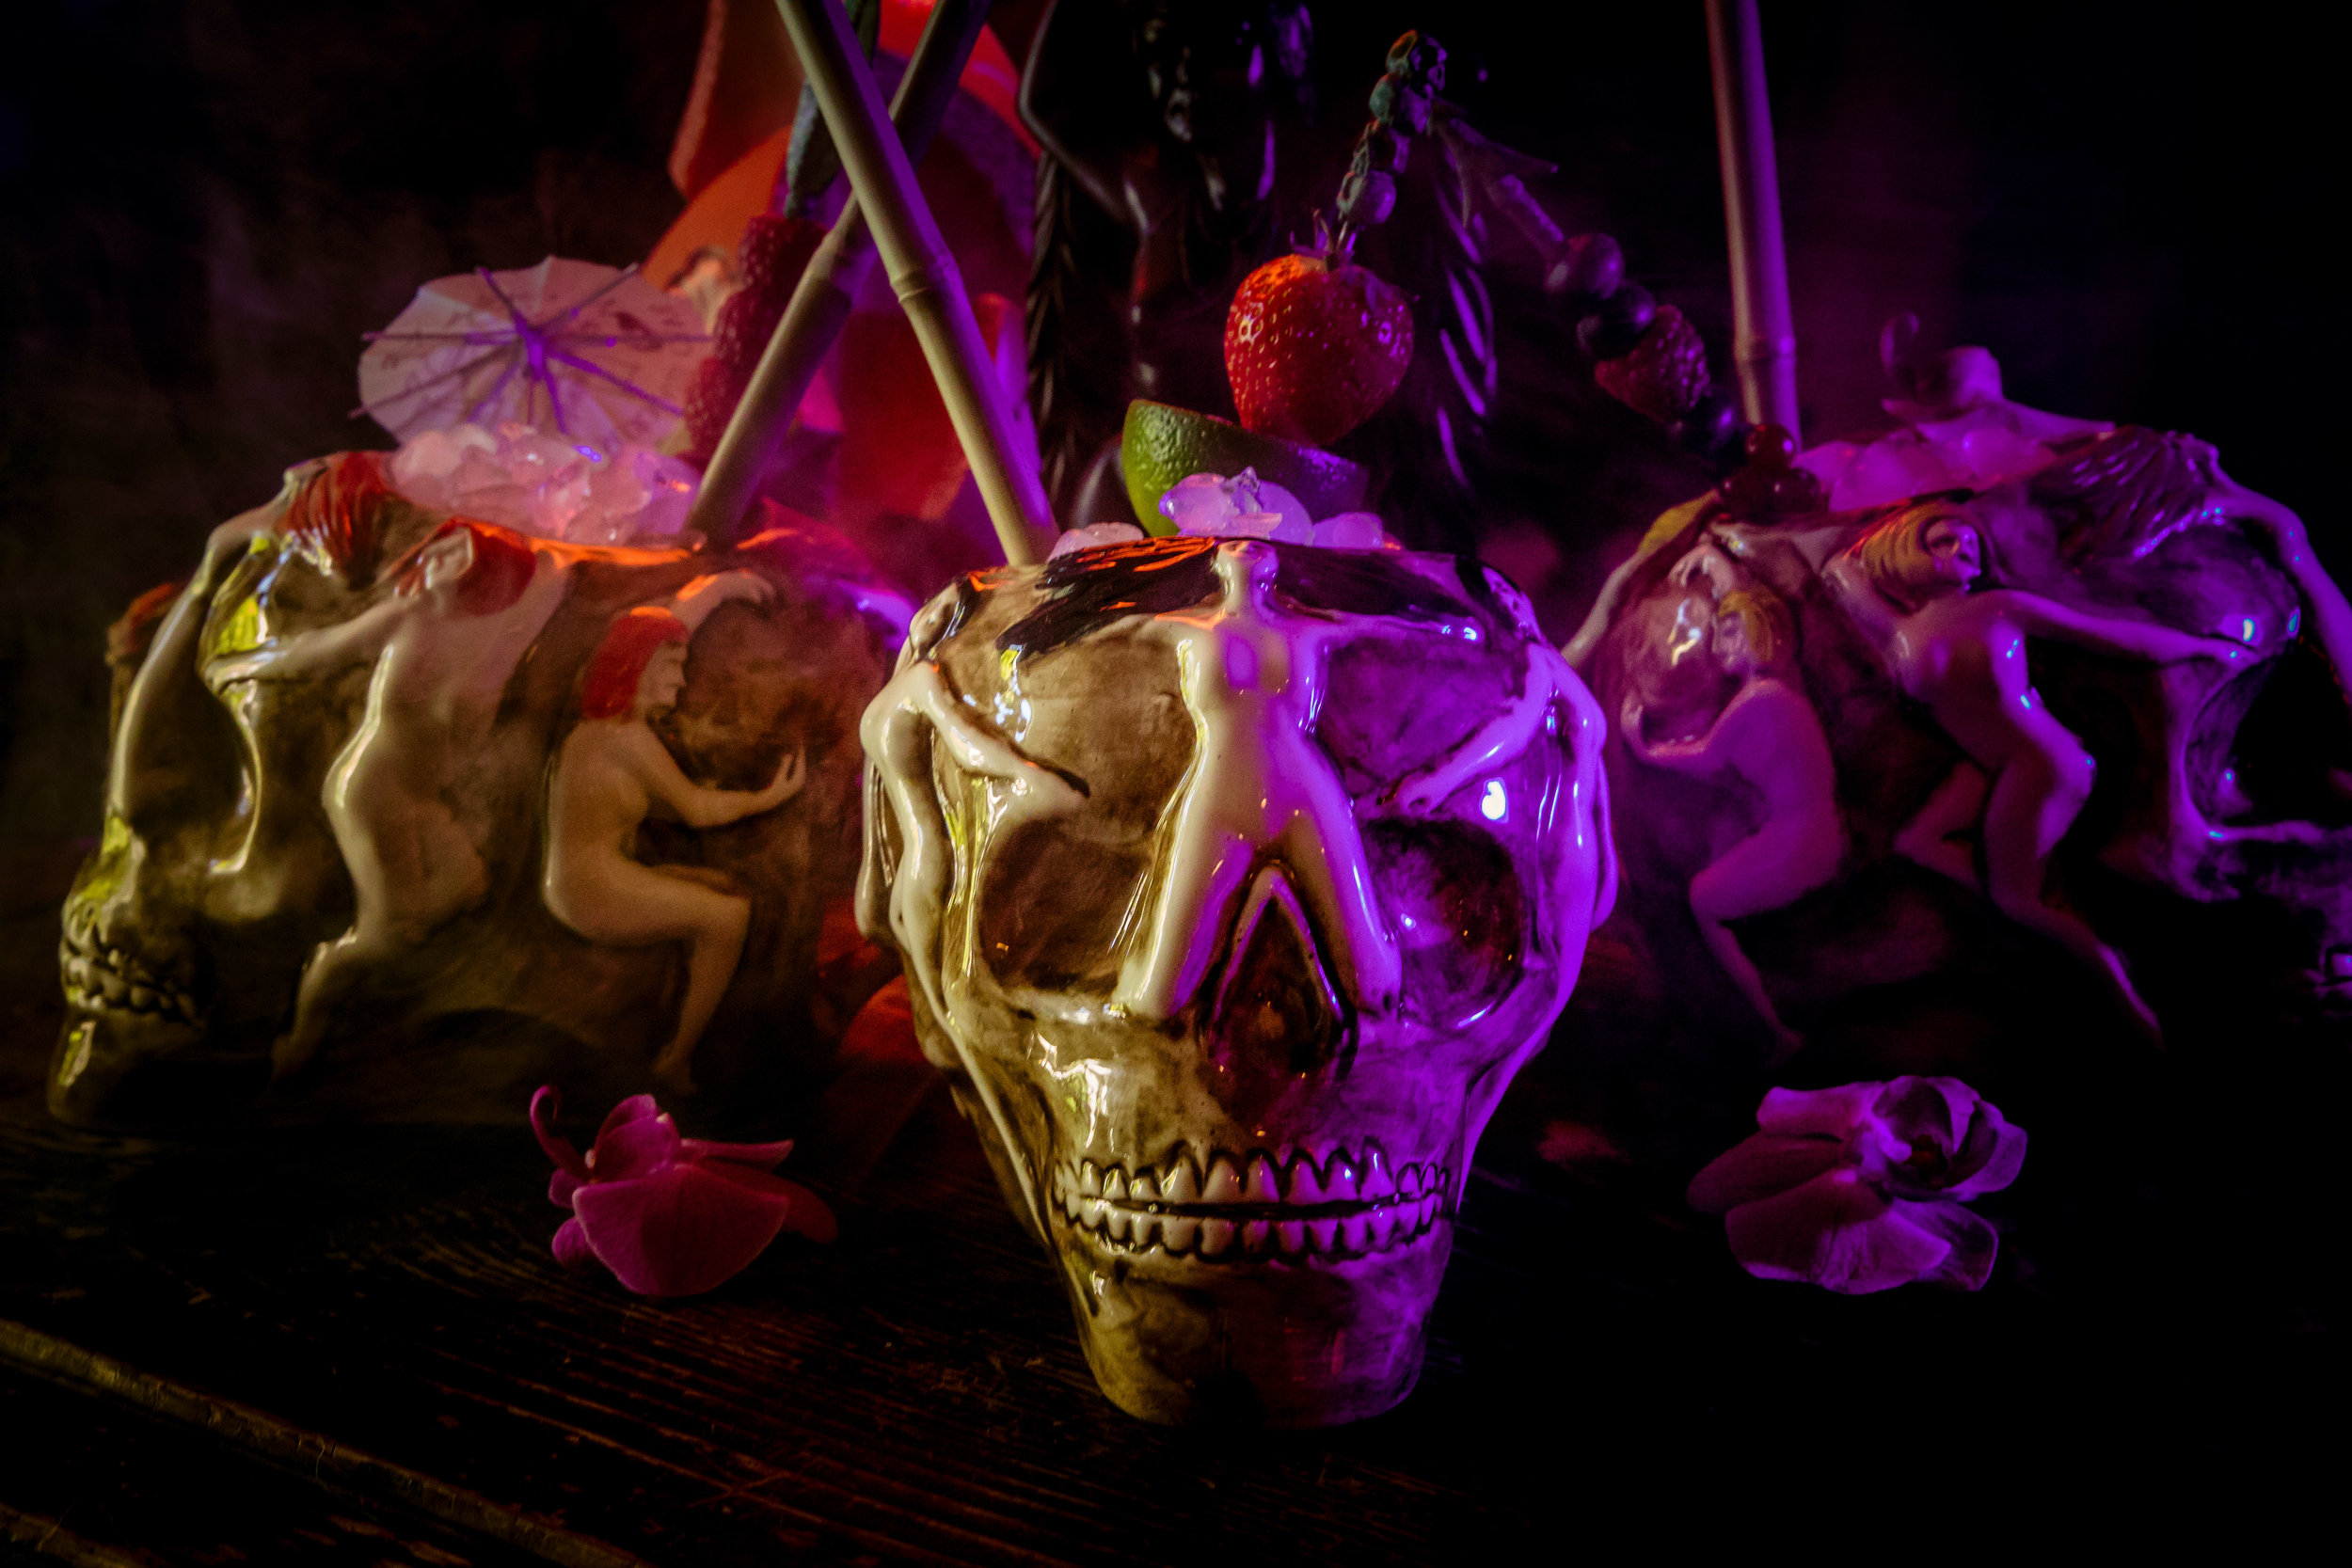 Hurricane Skull Set | Crypotikimugs 2019 by Dirk Behlau-1207.jpg